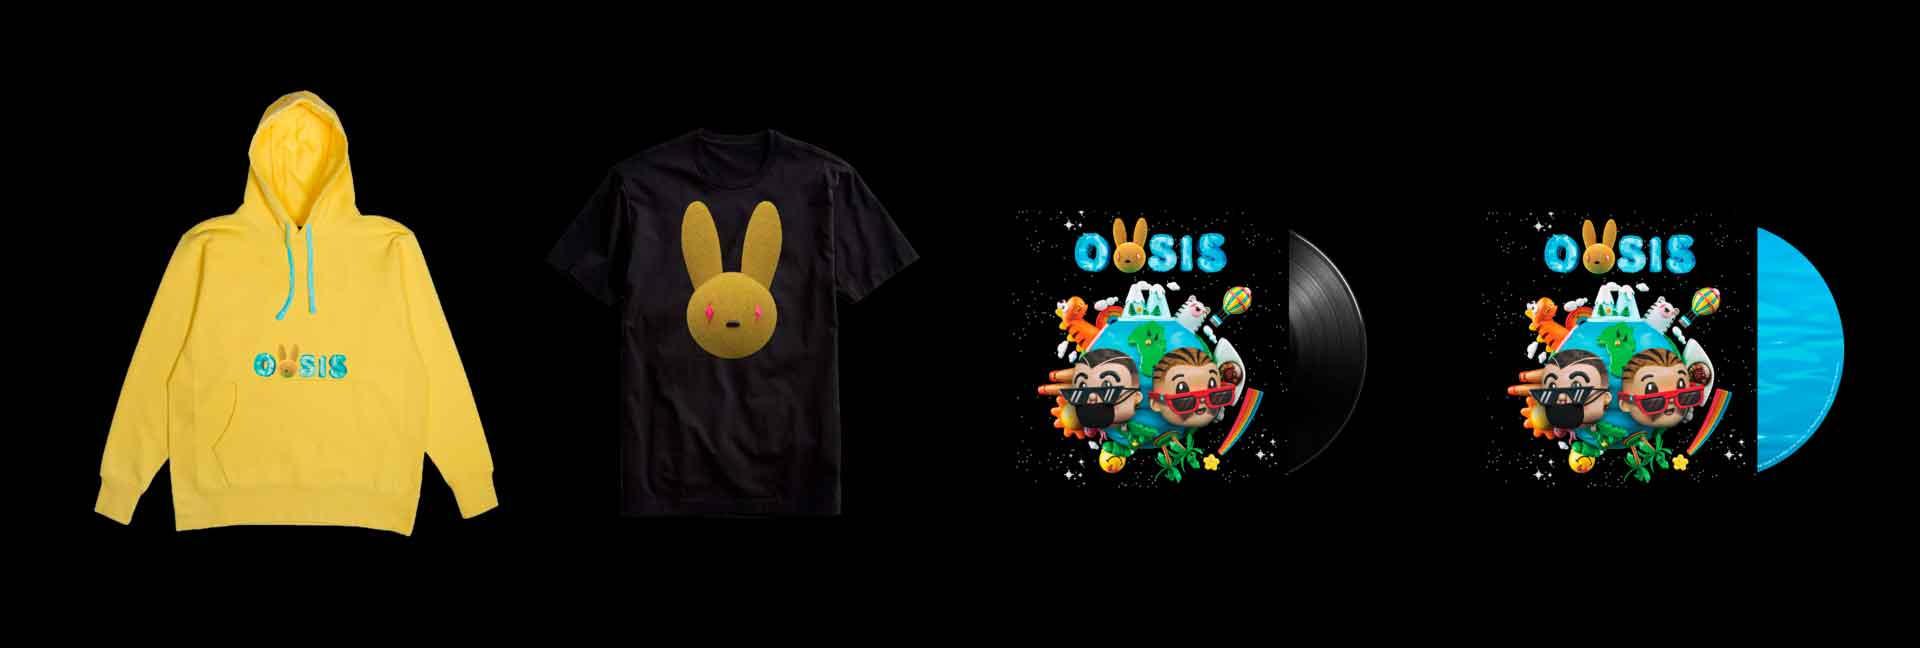 album_oasis_chocotoy_34.jpg